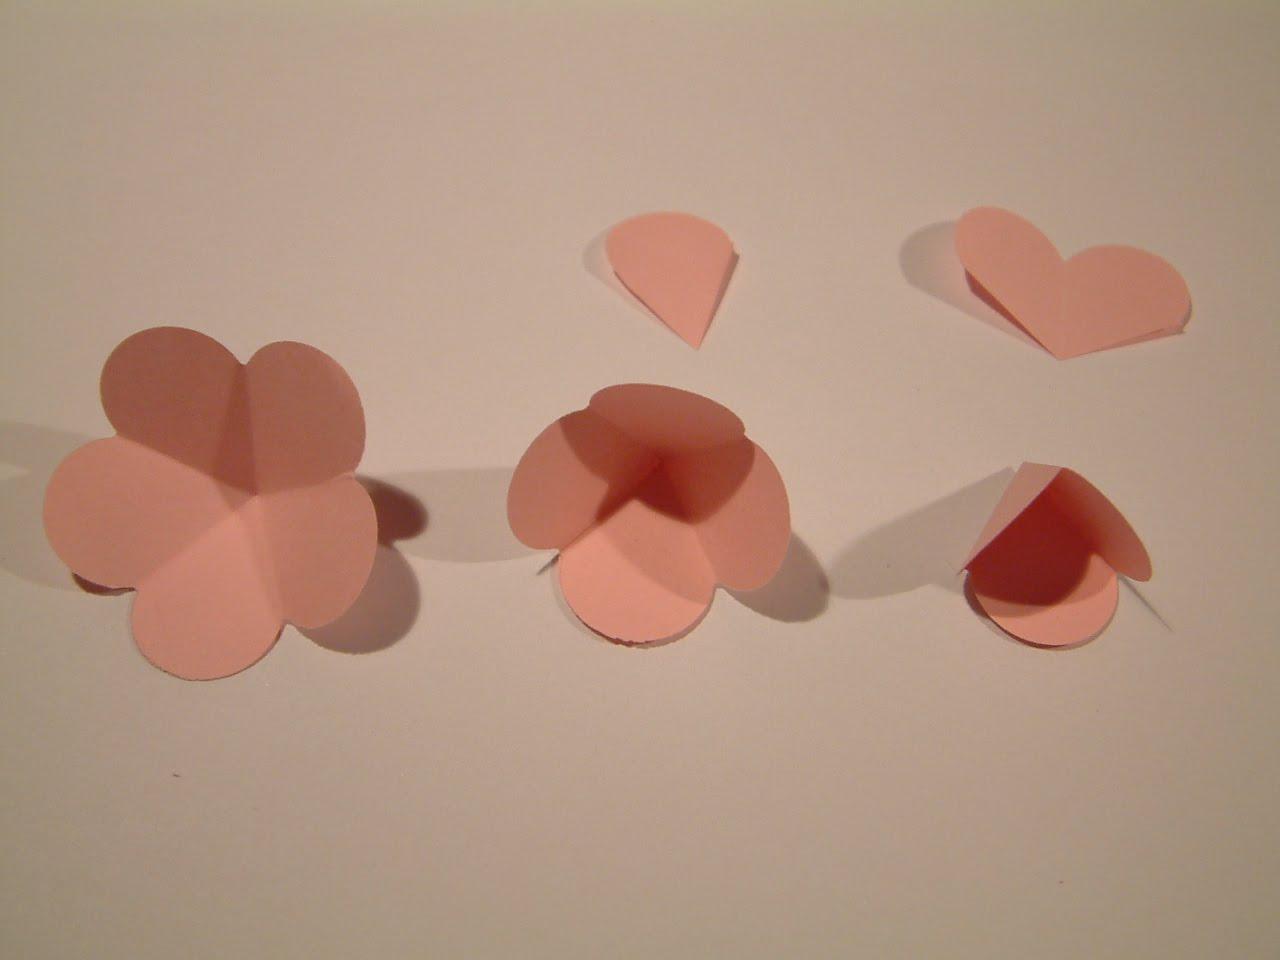 marions bastelst bchen tutorial papier rose. Black Bedroom Furniture Sets. Home Design Ideas